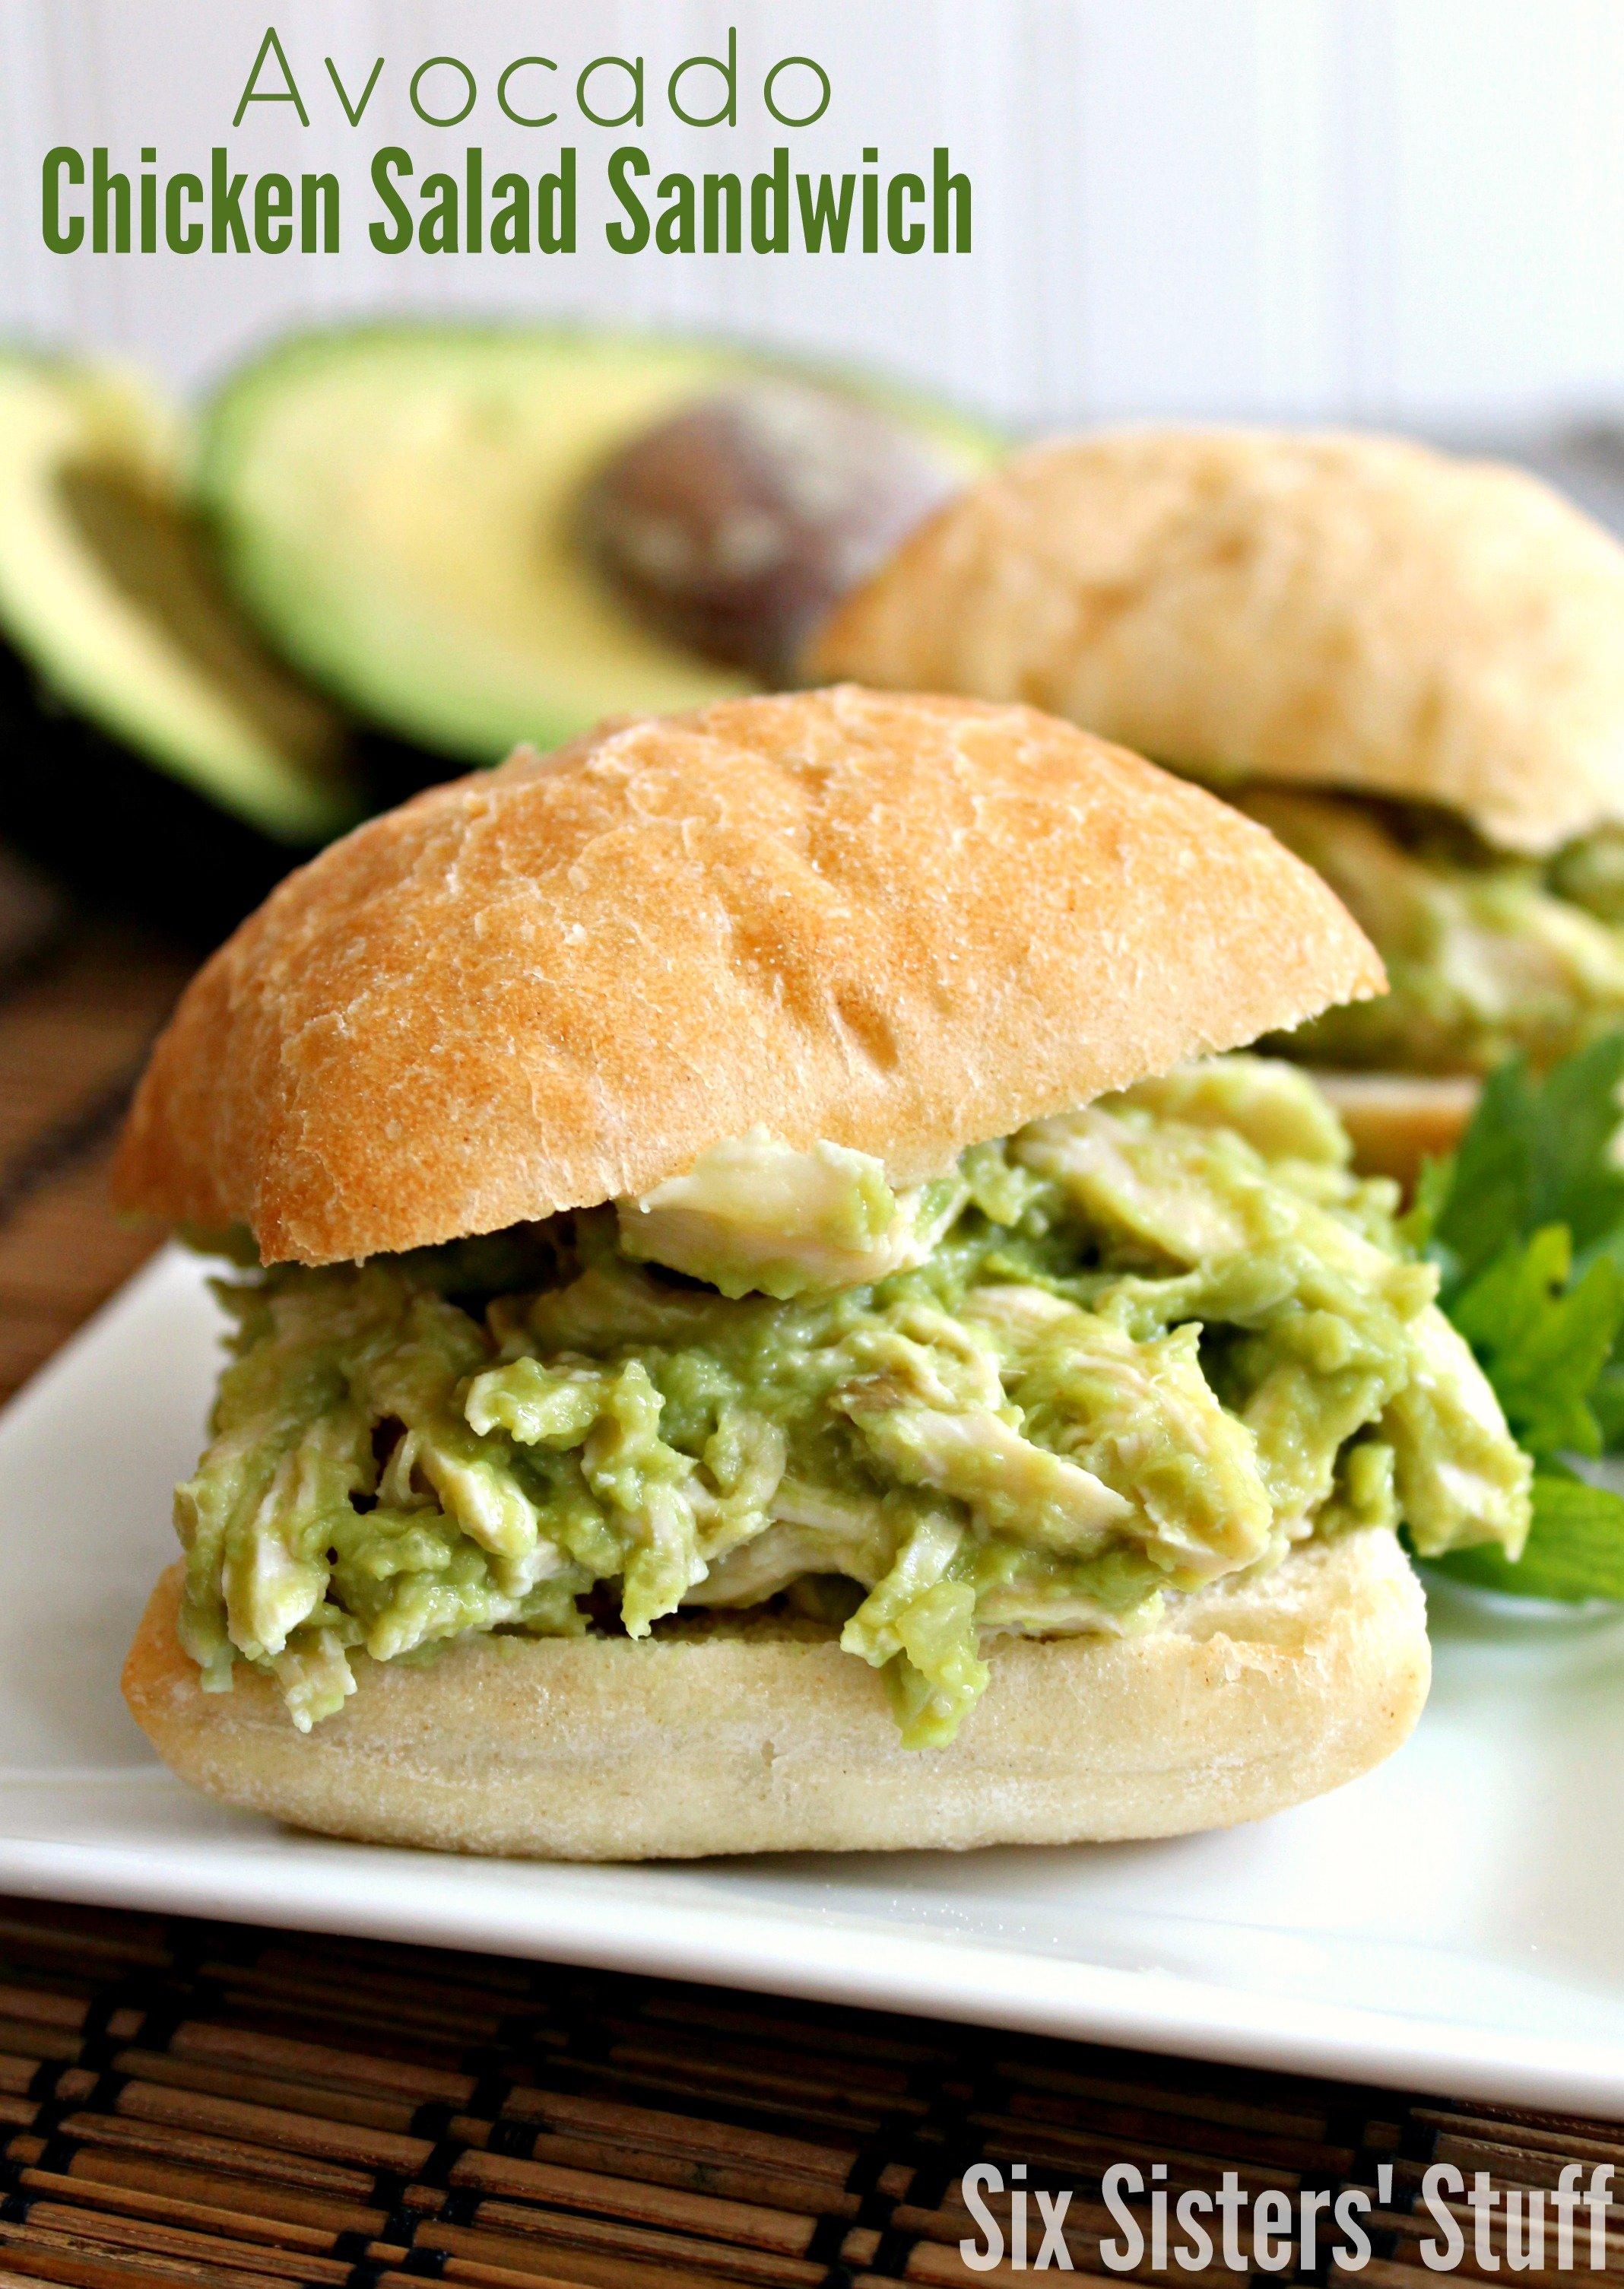 Avocado Chicken Salad Sandwiches Recipe